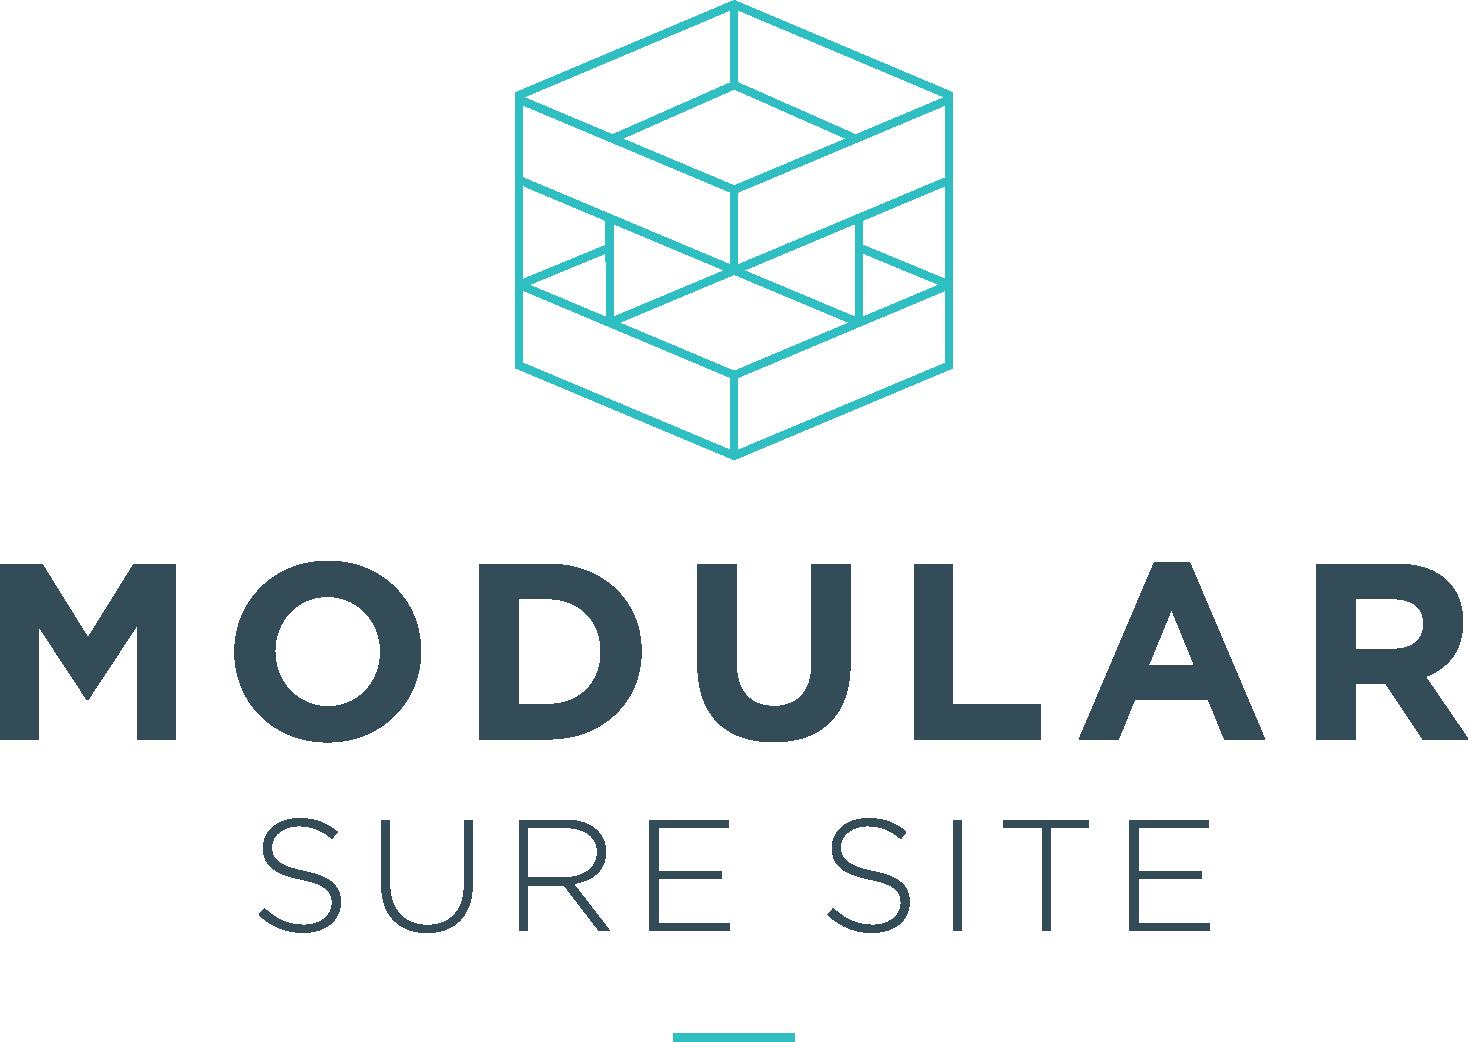 ModularSureSite_Logo_Color